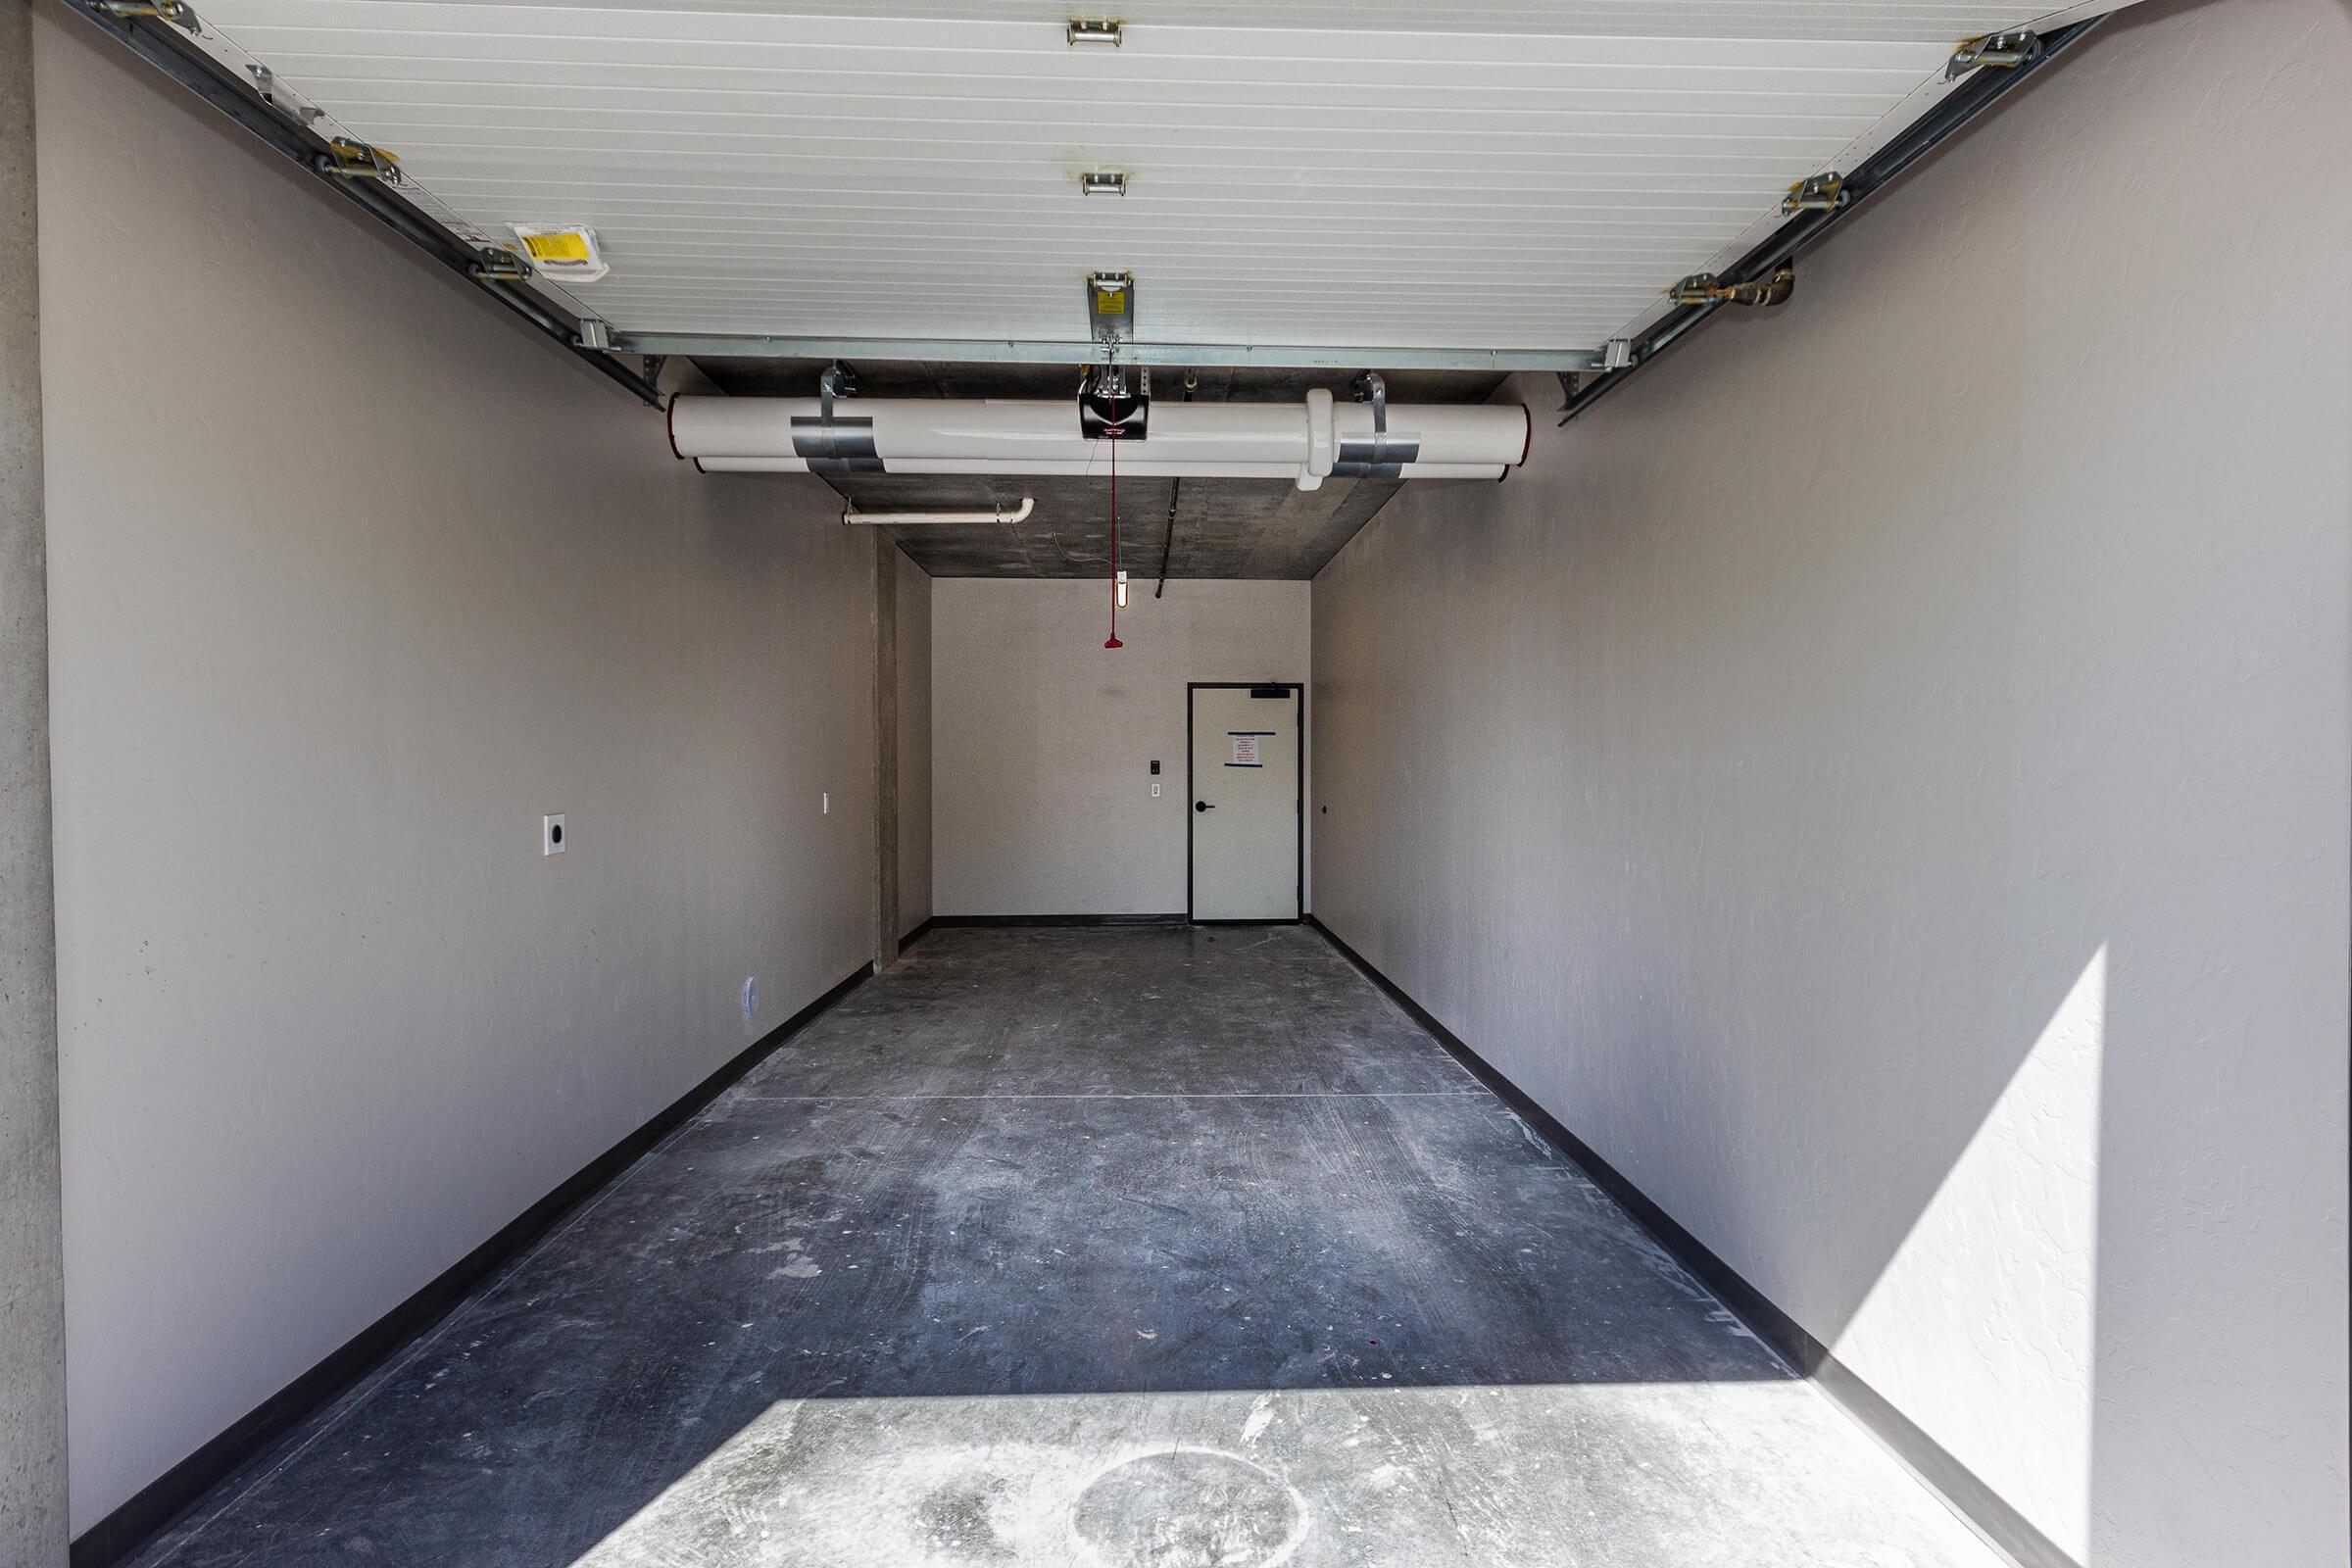 Garage Interior Looking In.jpg